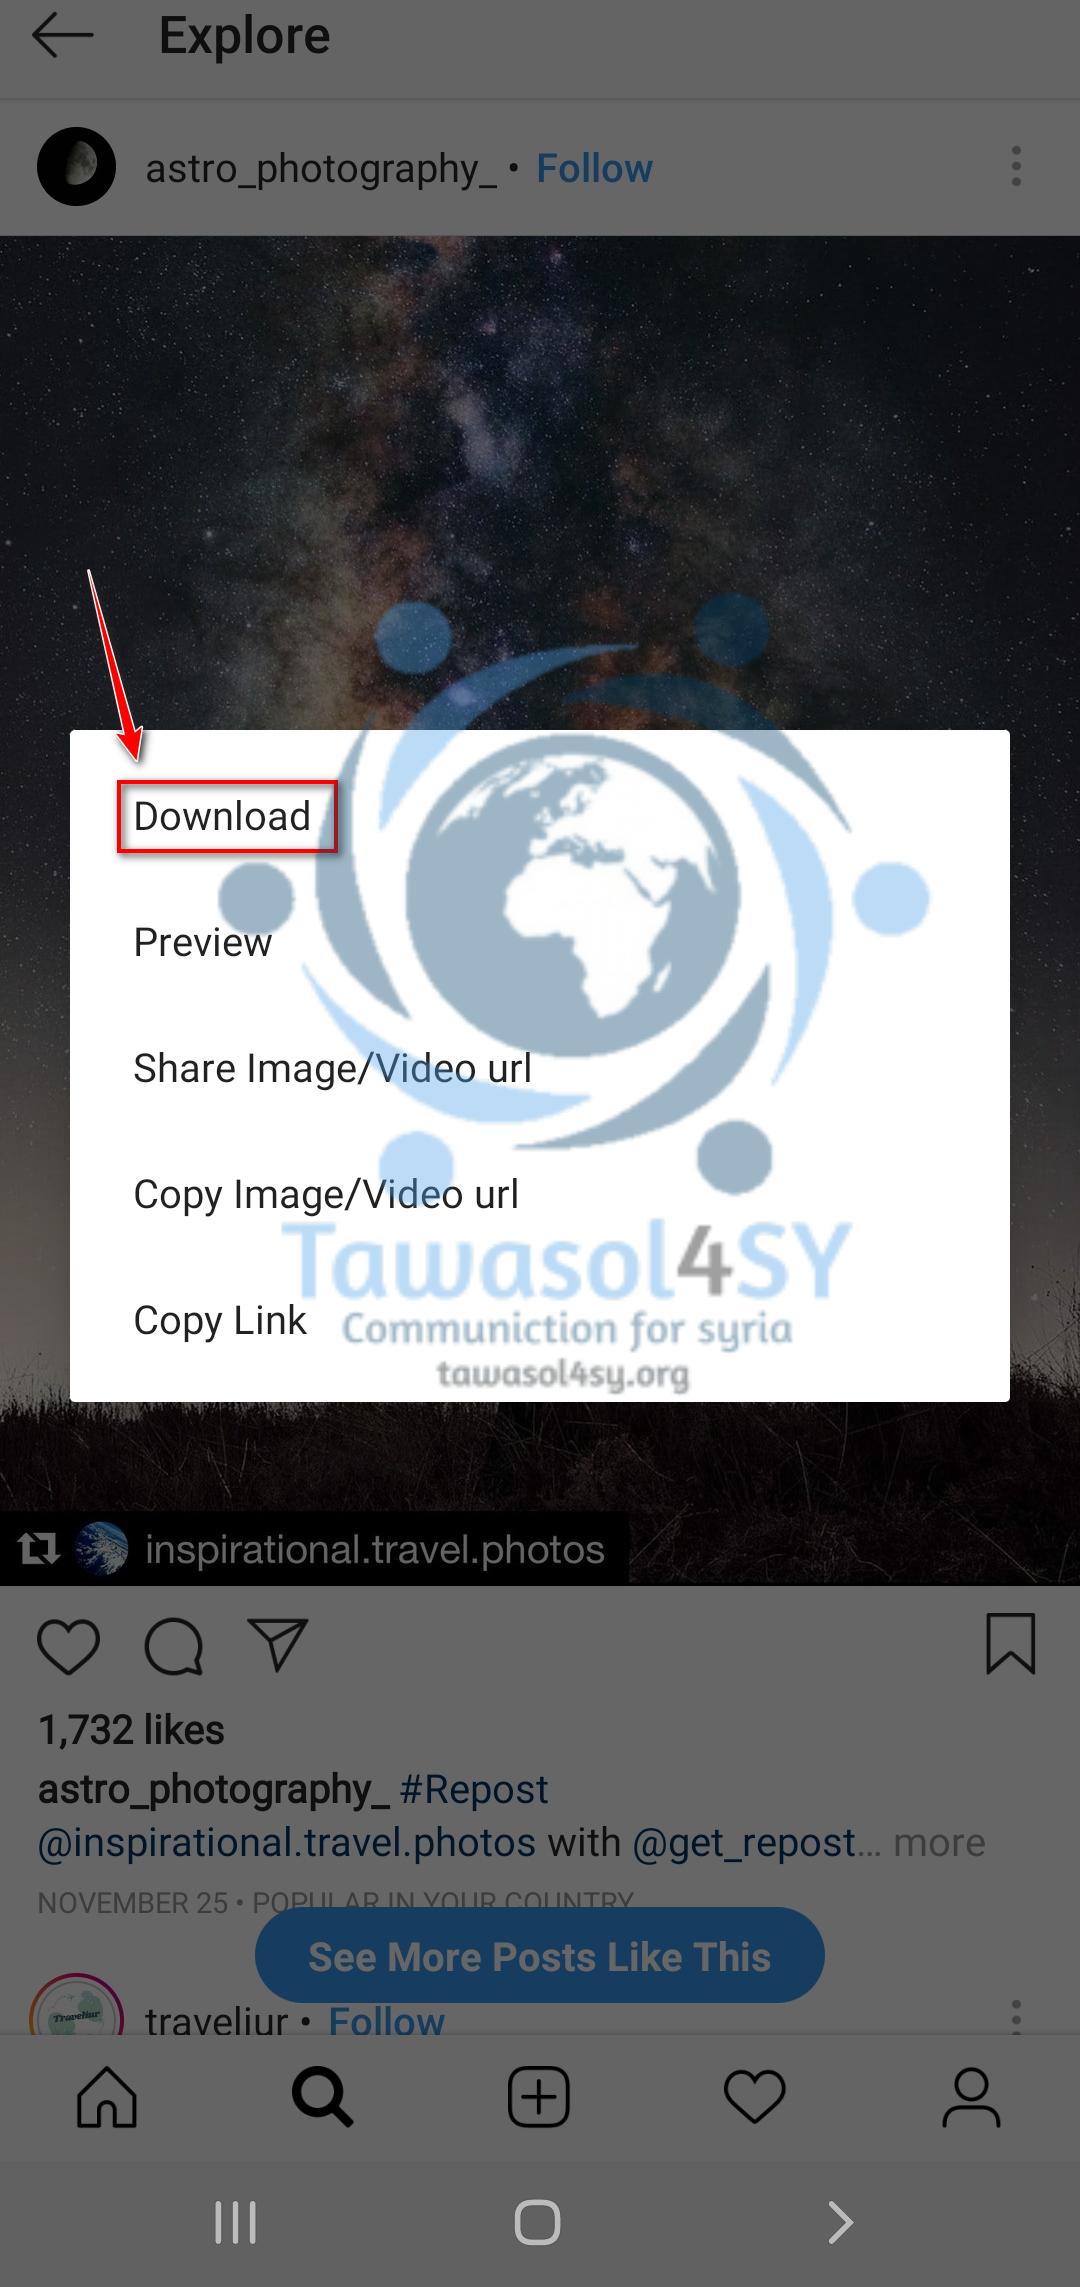 Congratulations, download button - GB Instagram